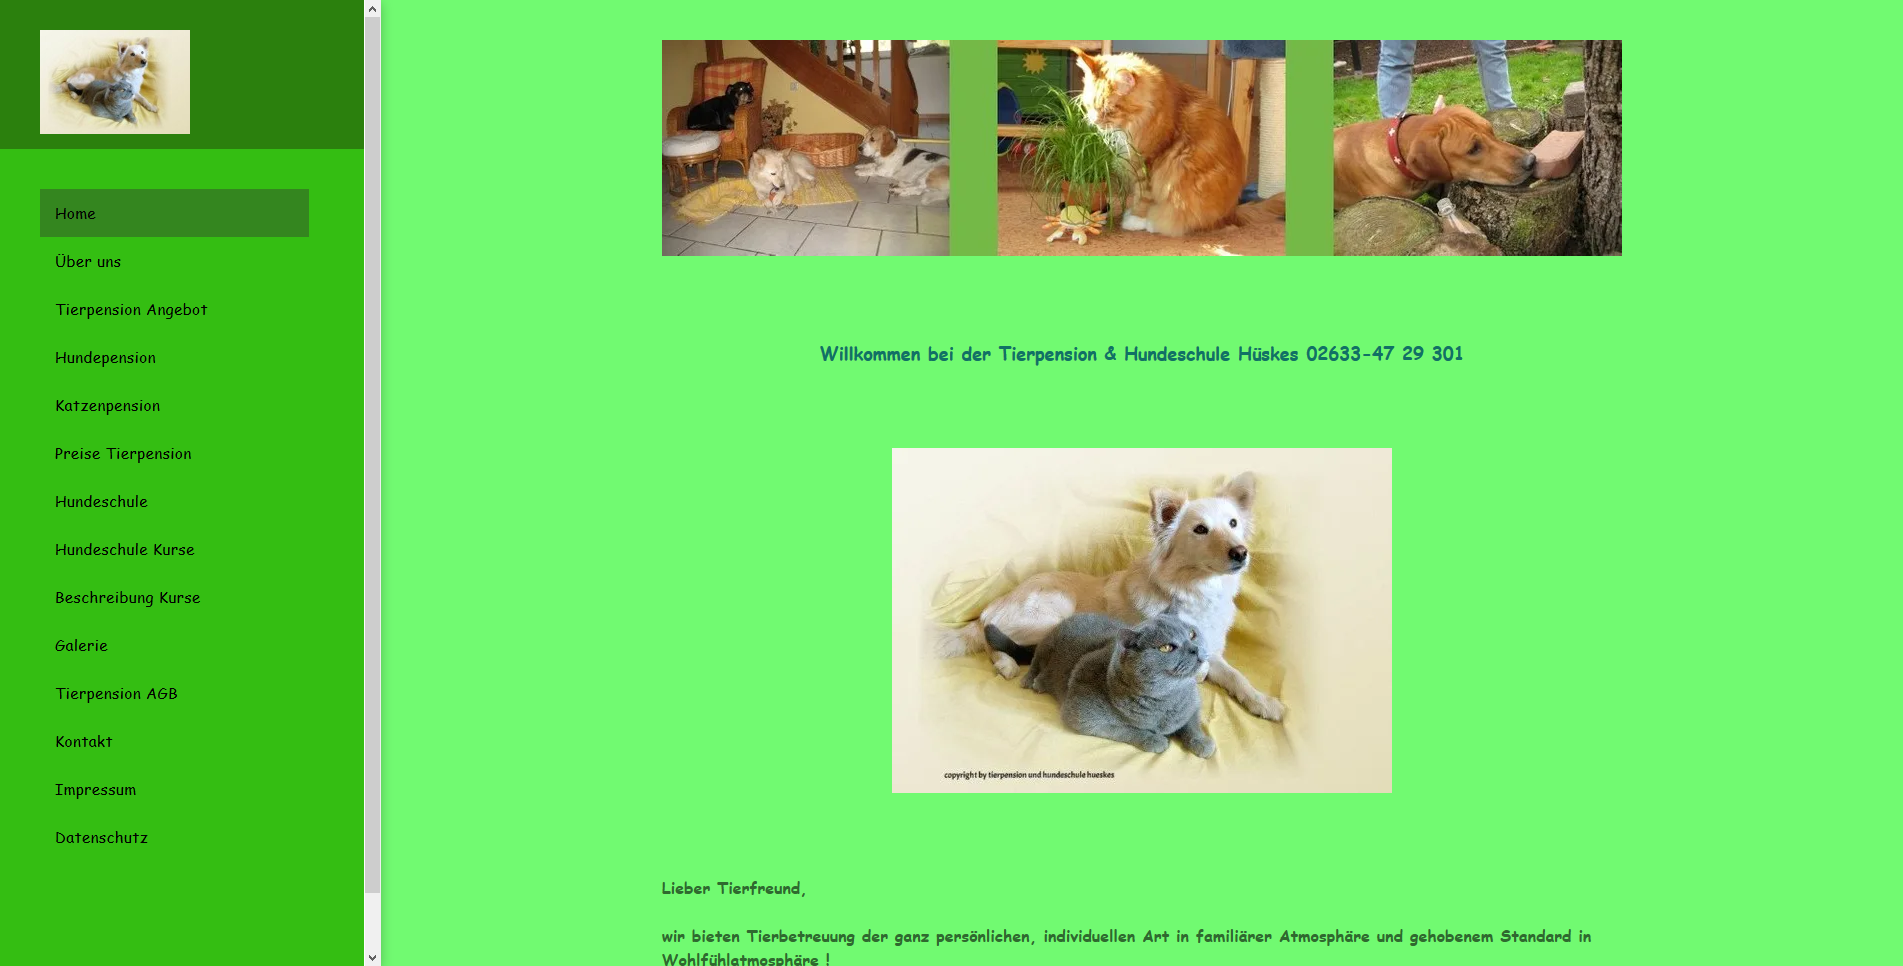 Tierpension und Hundeschule Hüskes